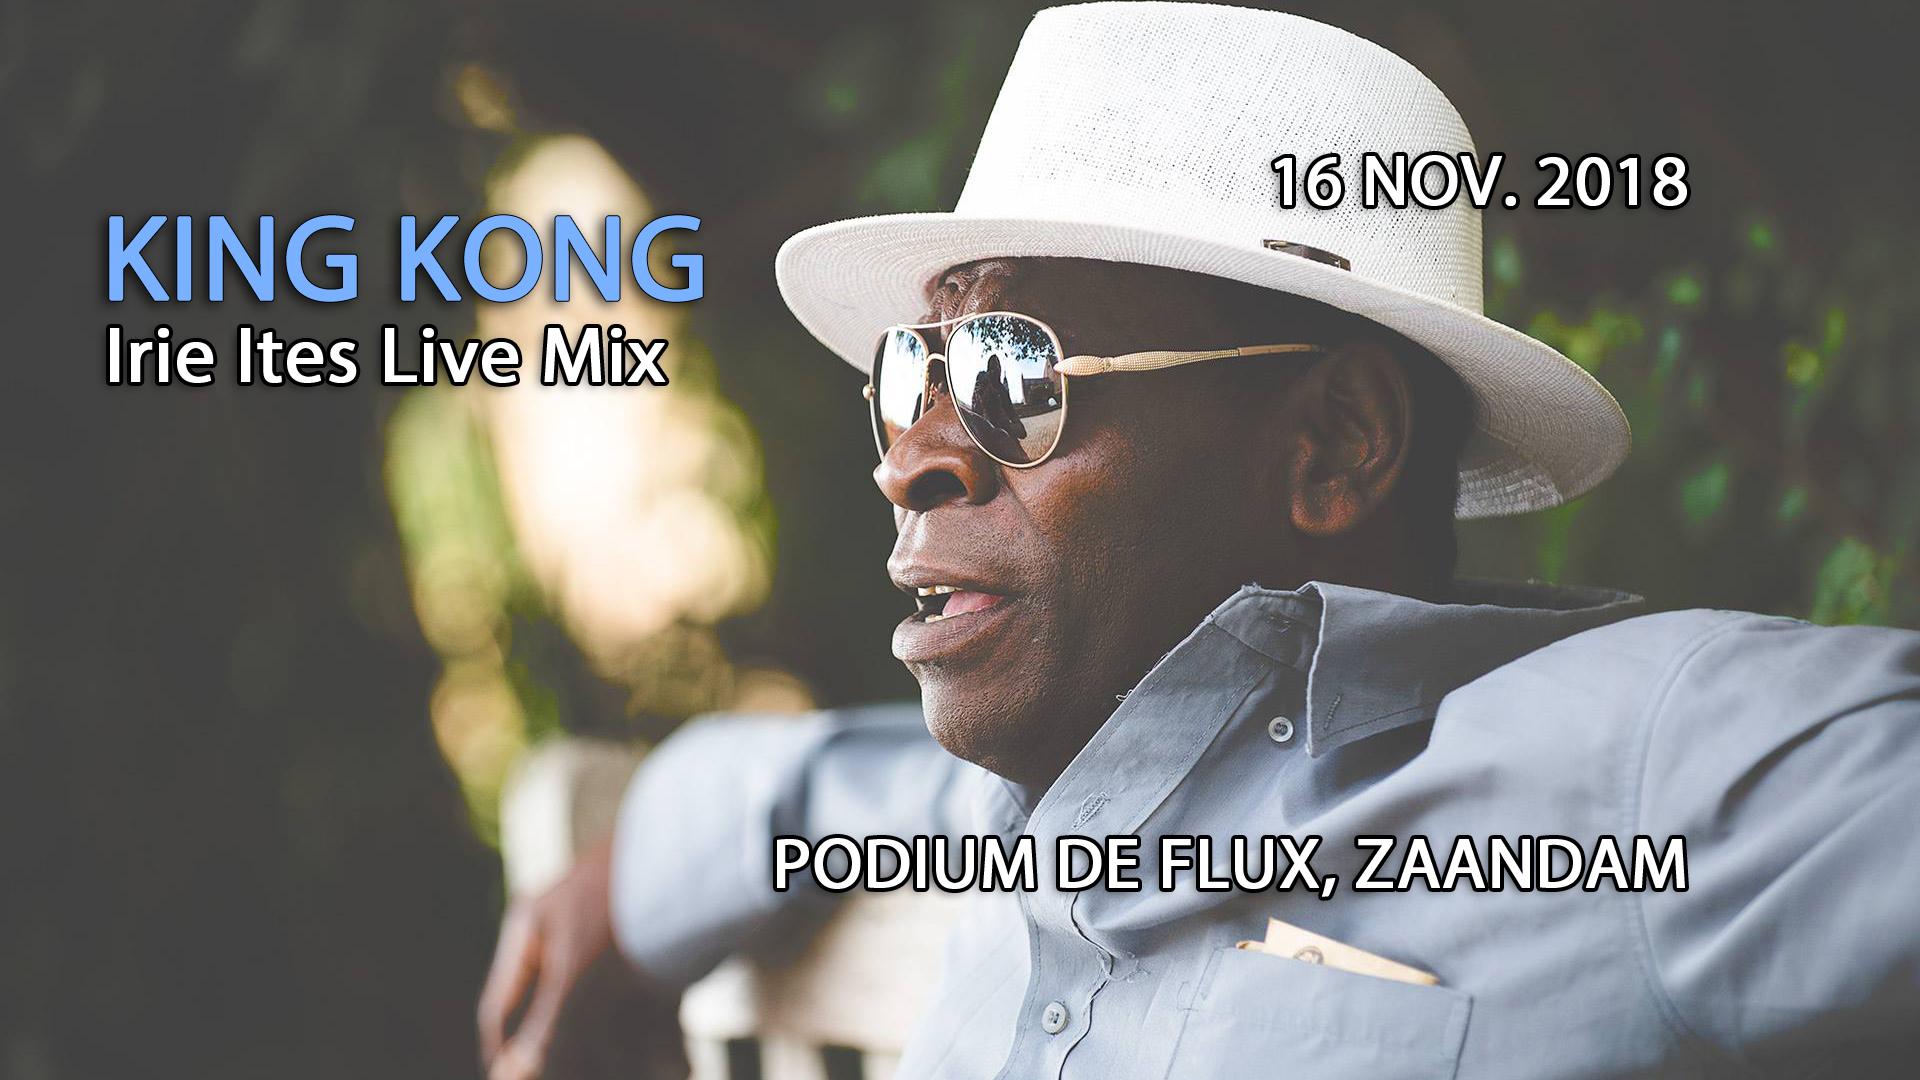 King Kong Irie Ites Live Mix (reggae-dub) | Podium de Flux